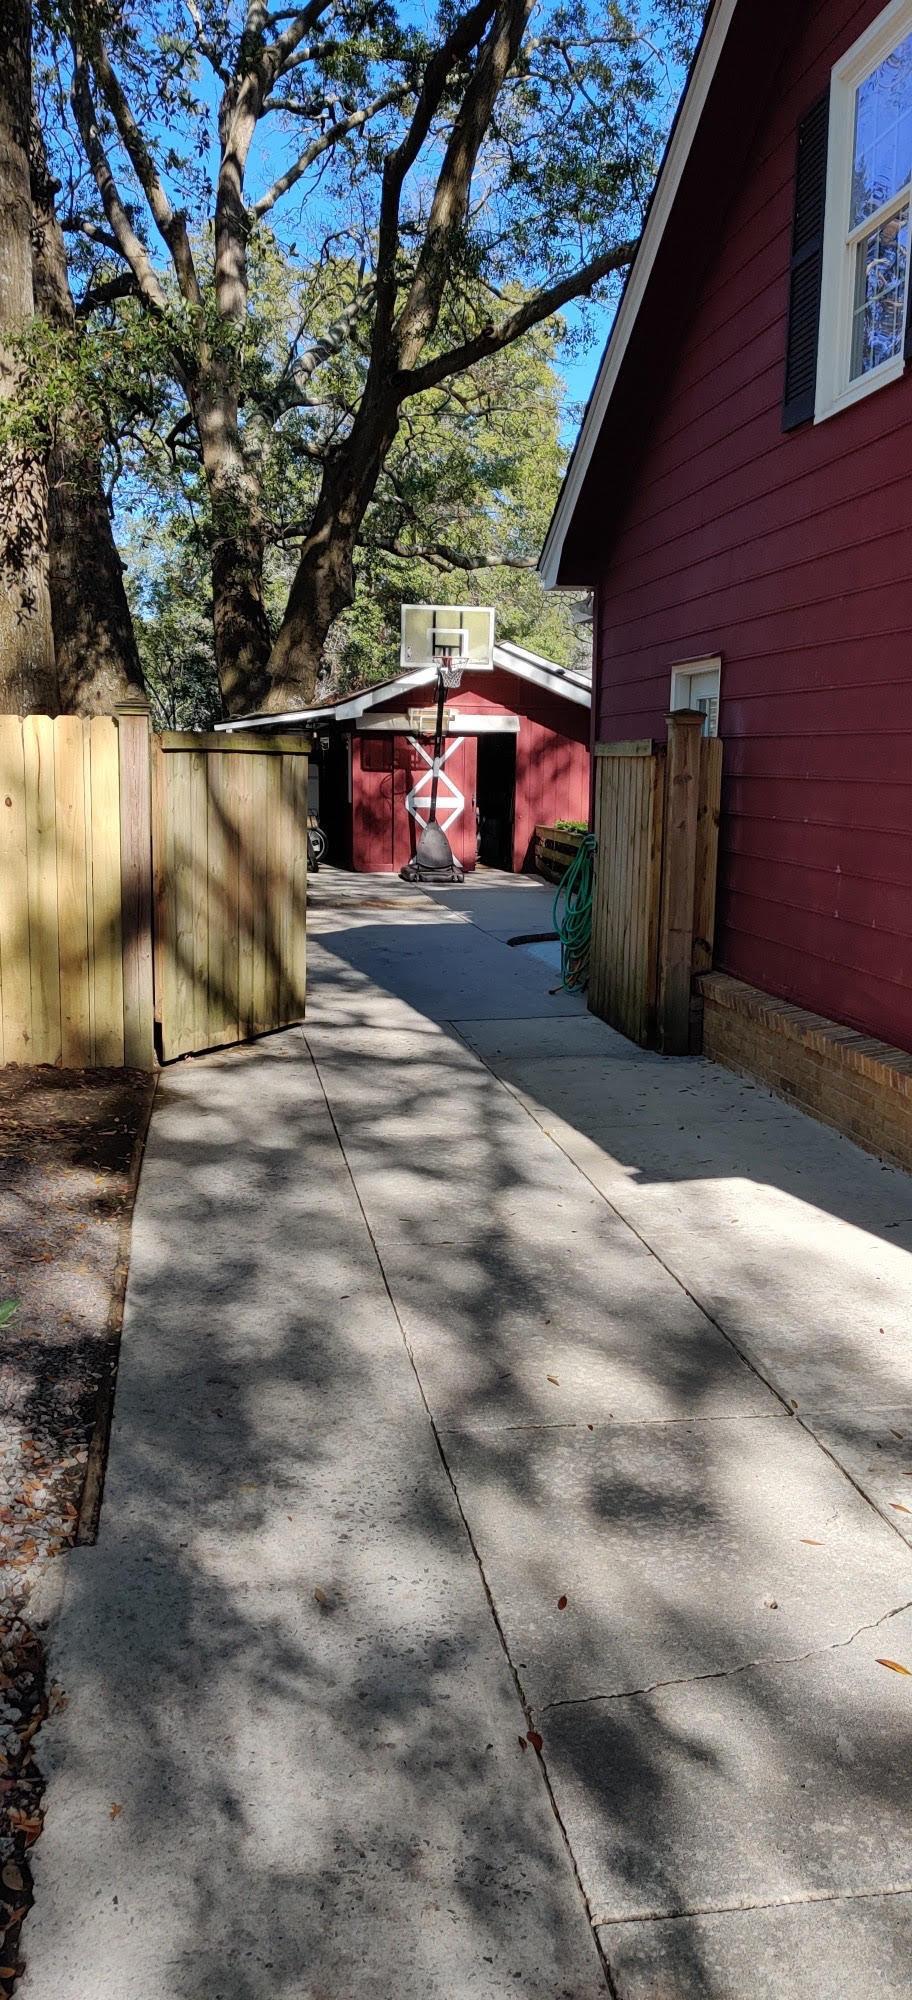 Shemwood II Homes For Sale - 950 Sea Gull, Mount Pleasant, SC - 0